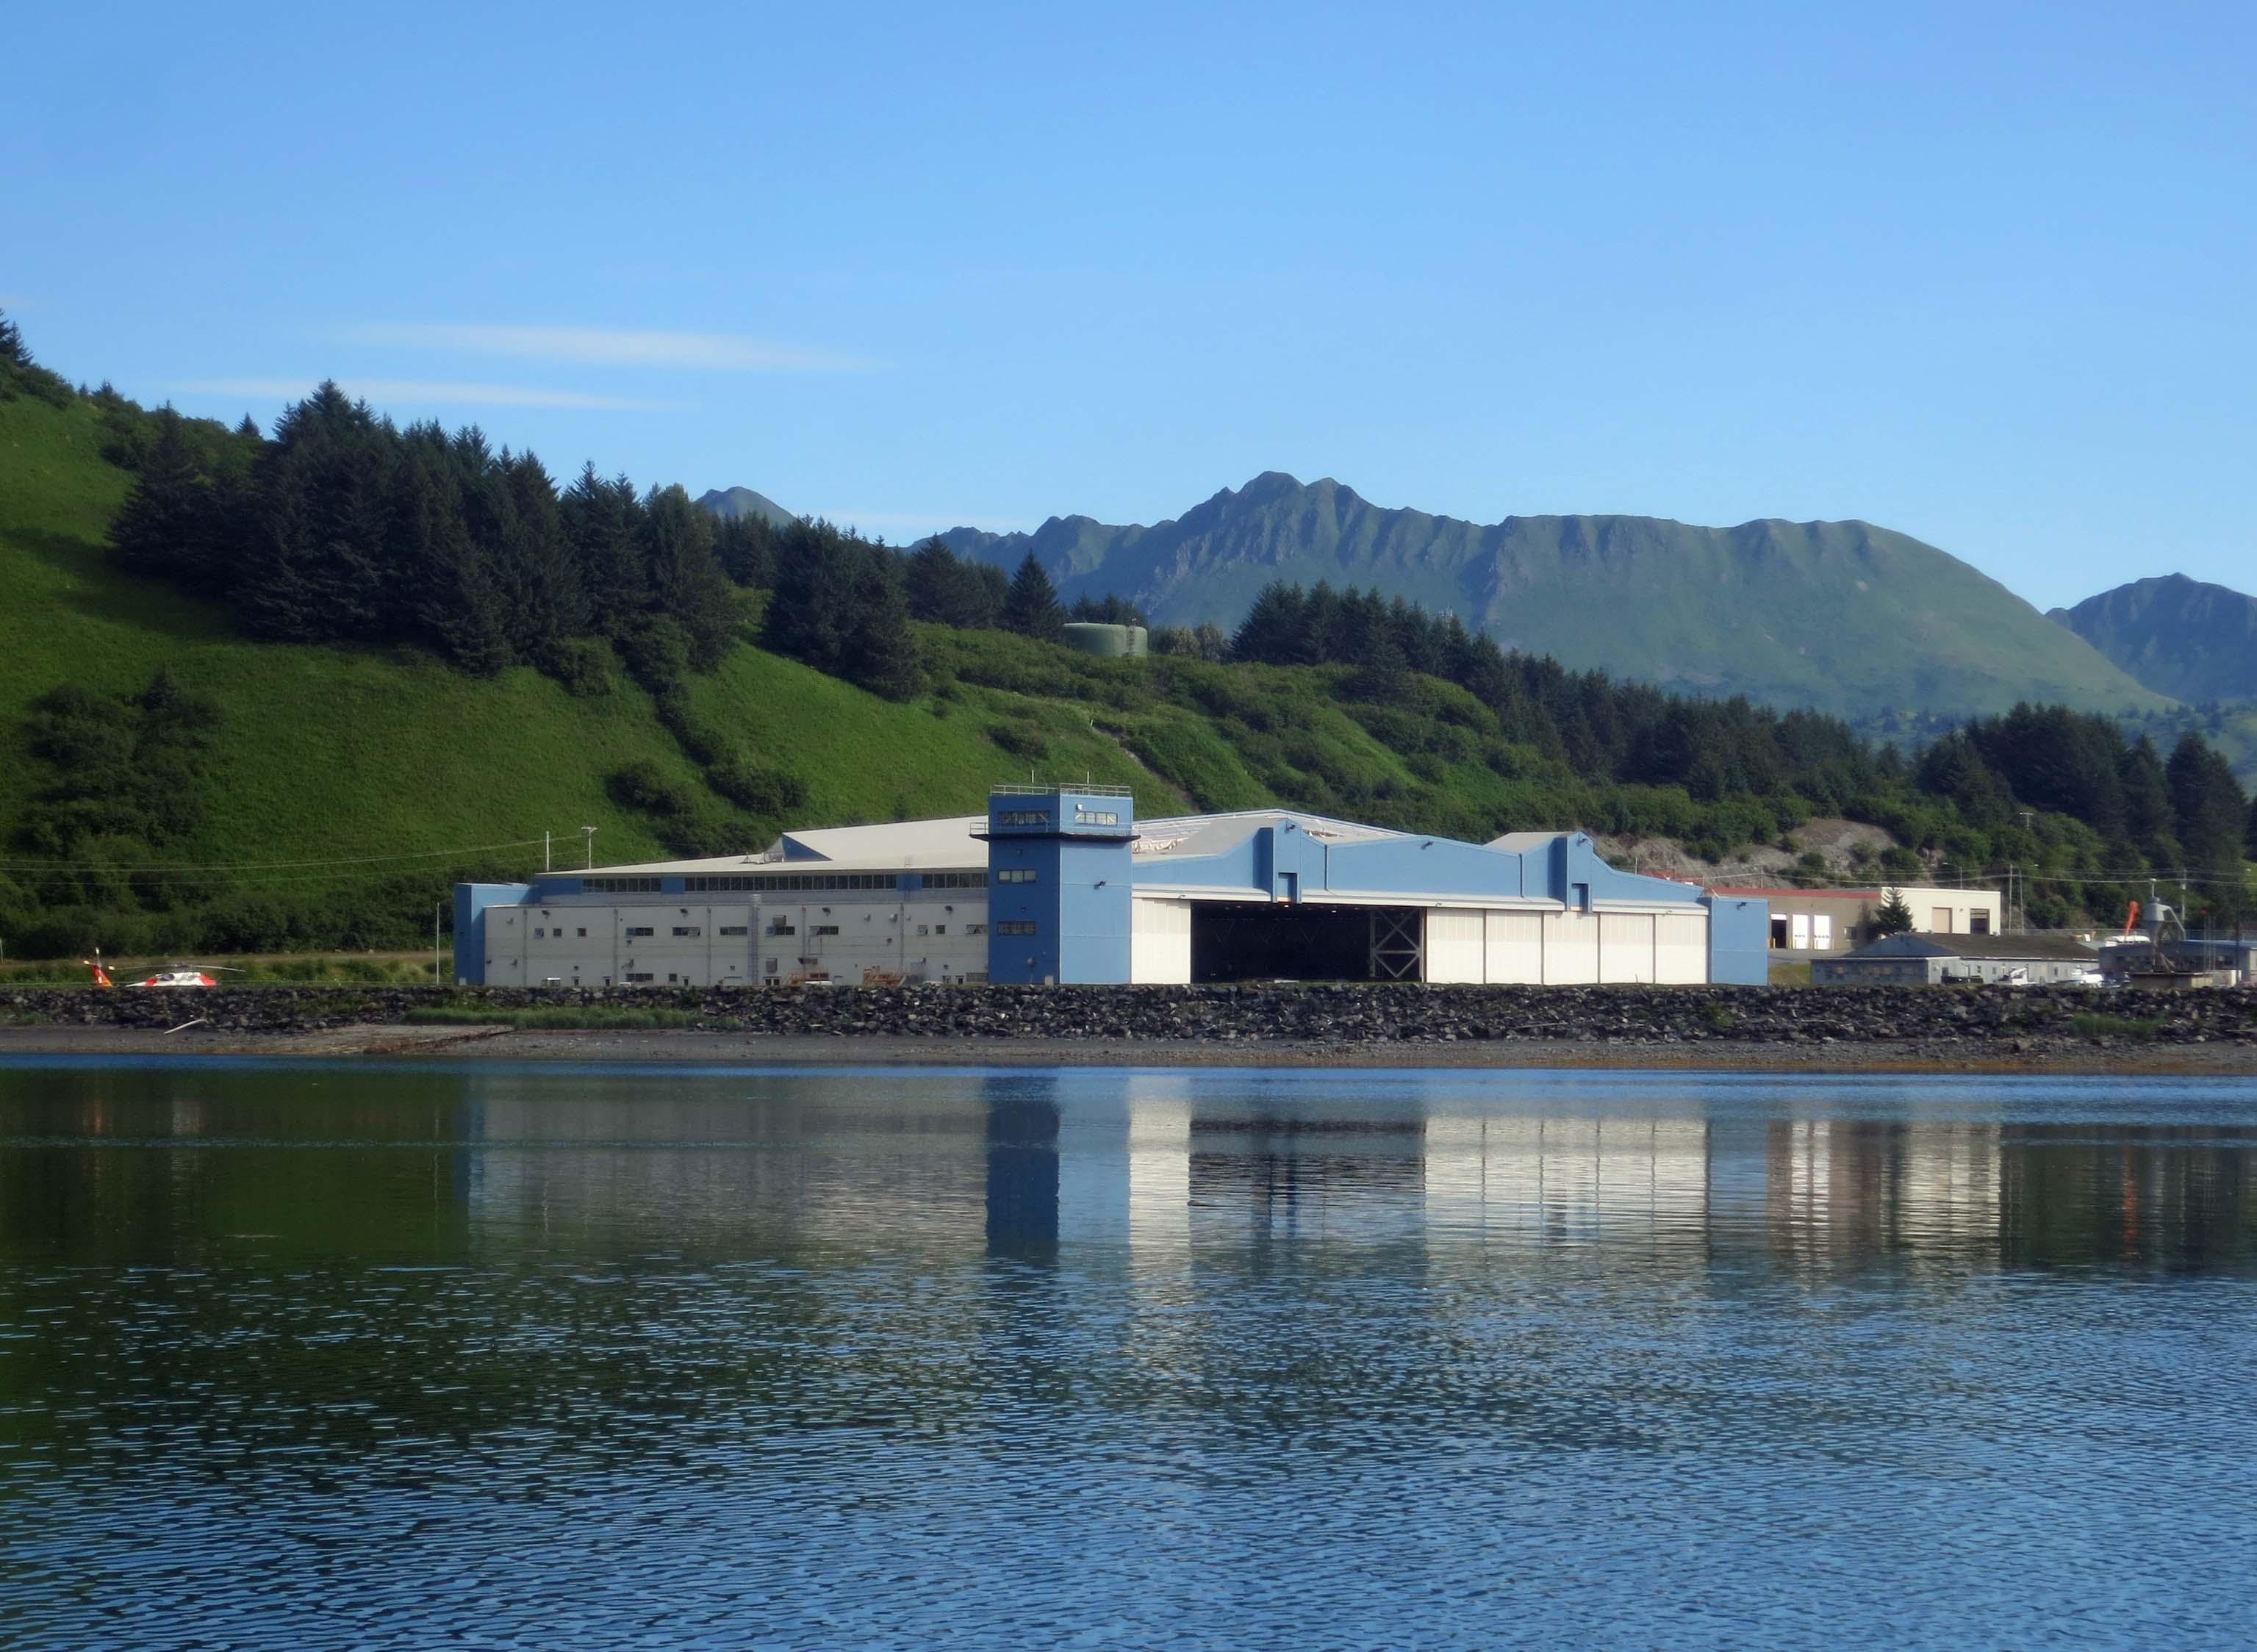 The Coast Guard's helicopter hangar/maintenance facility on Kodiak Island.